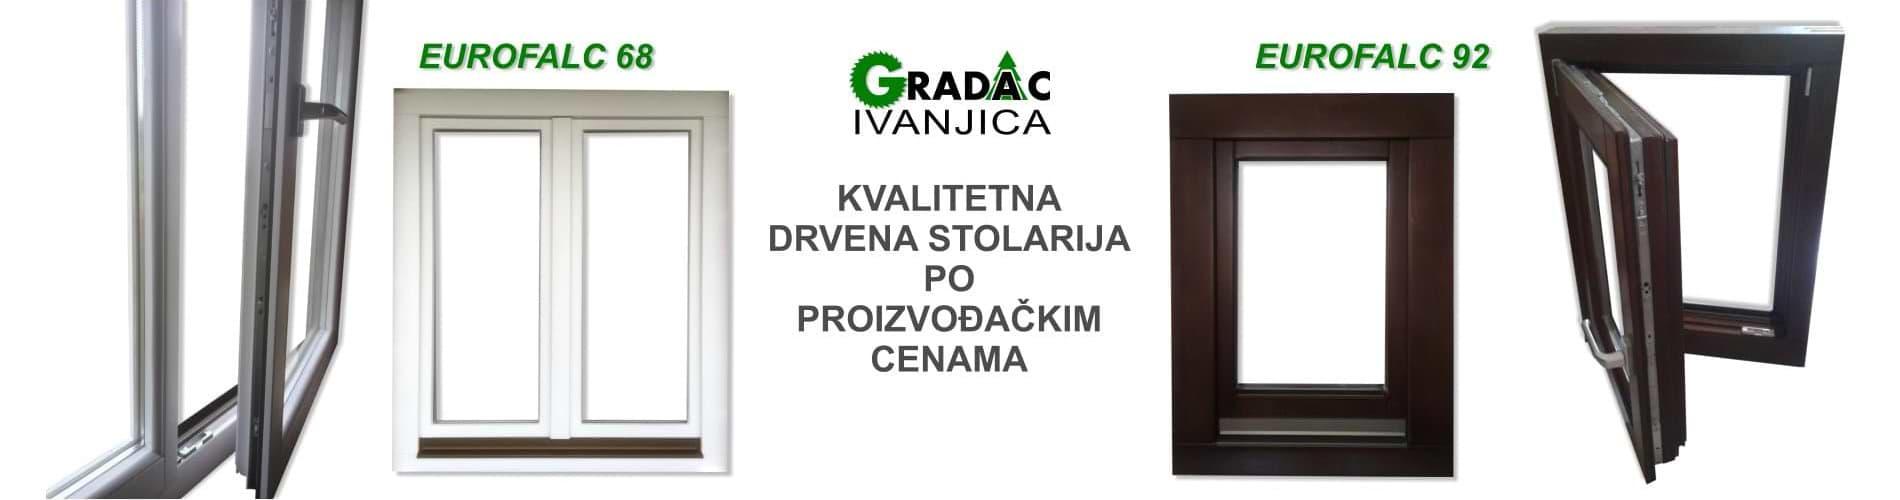 Kvalitetna drvena stolarija - Gradac, Ivanjica